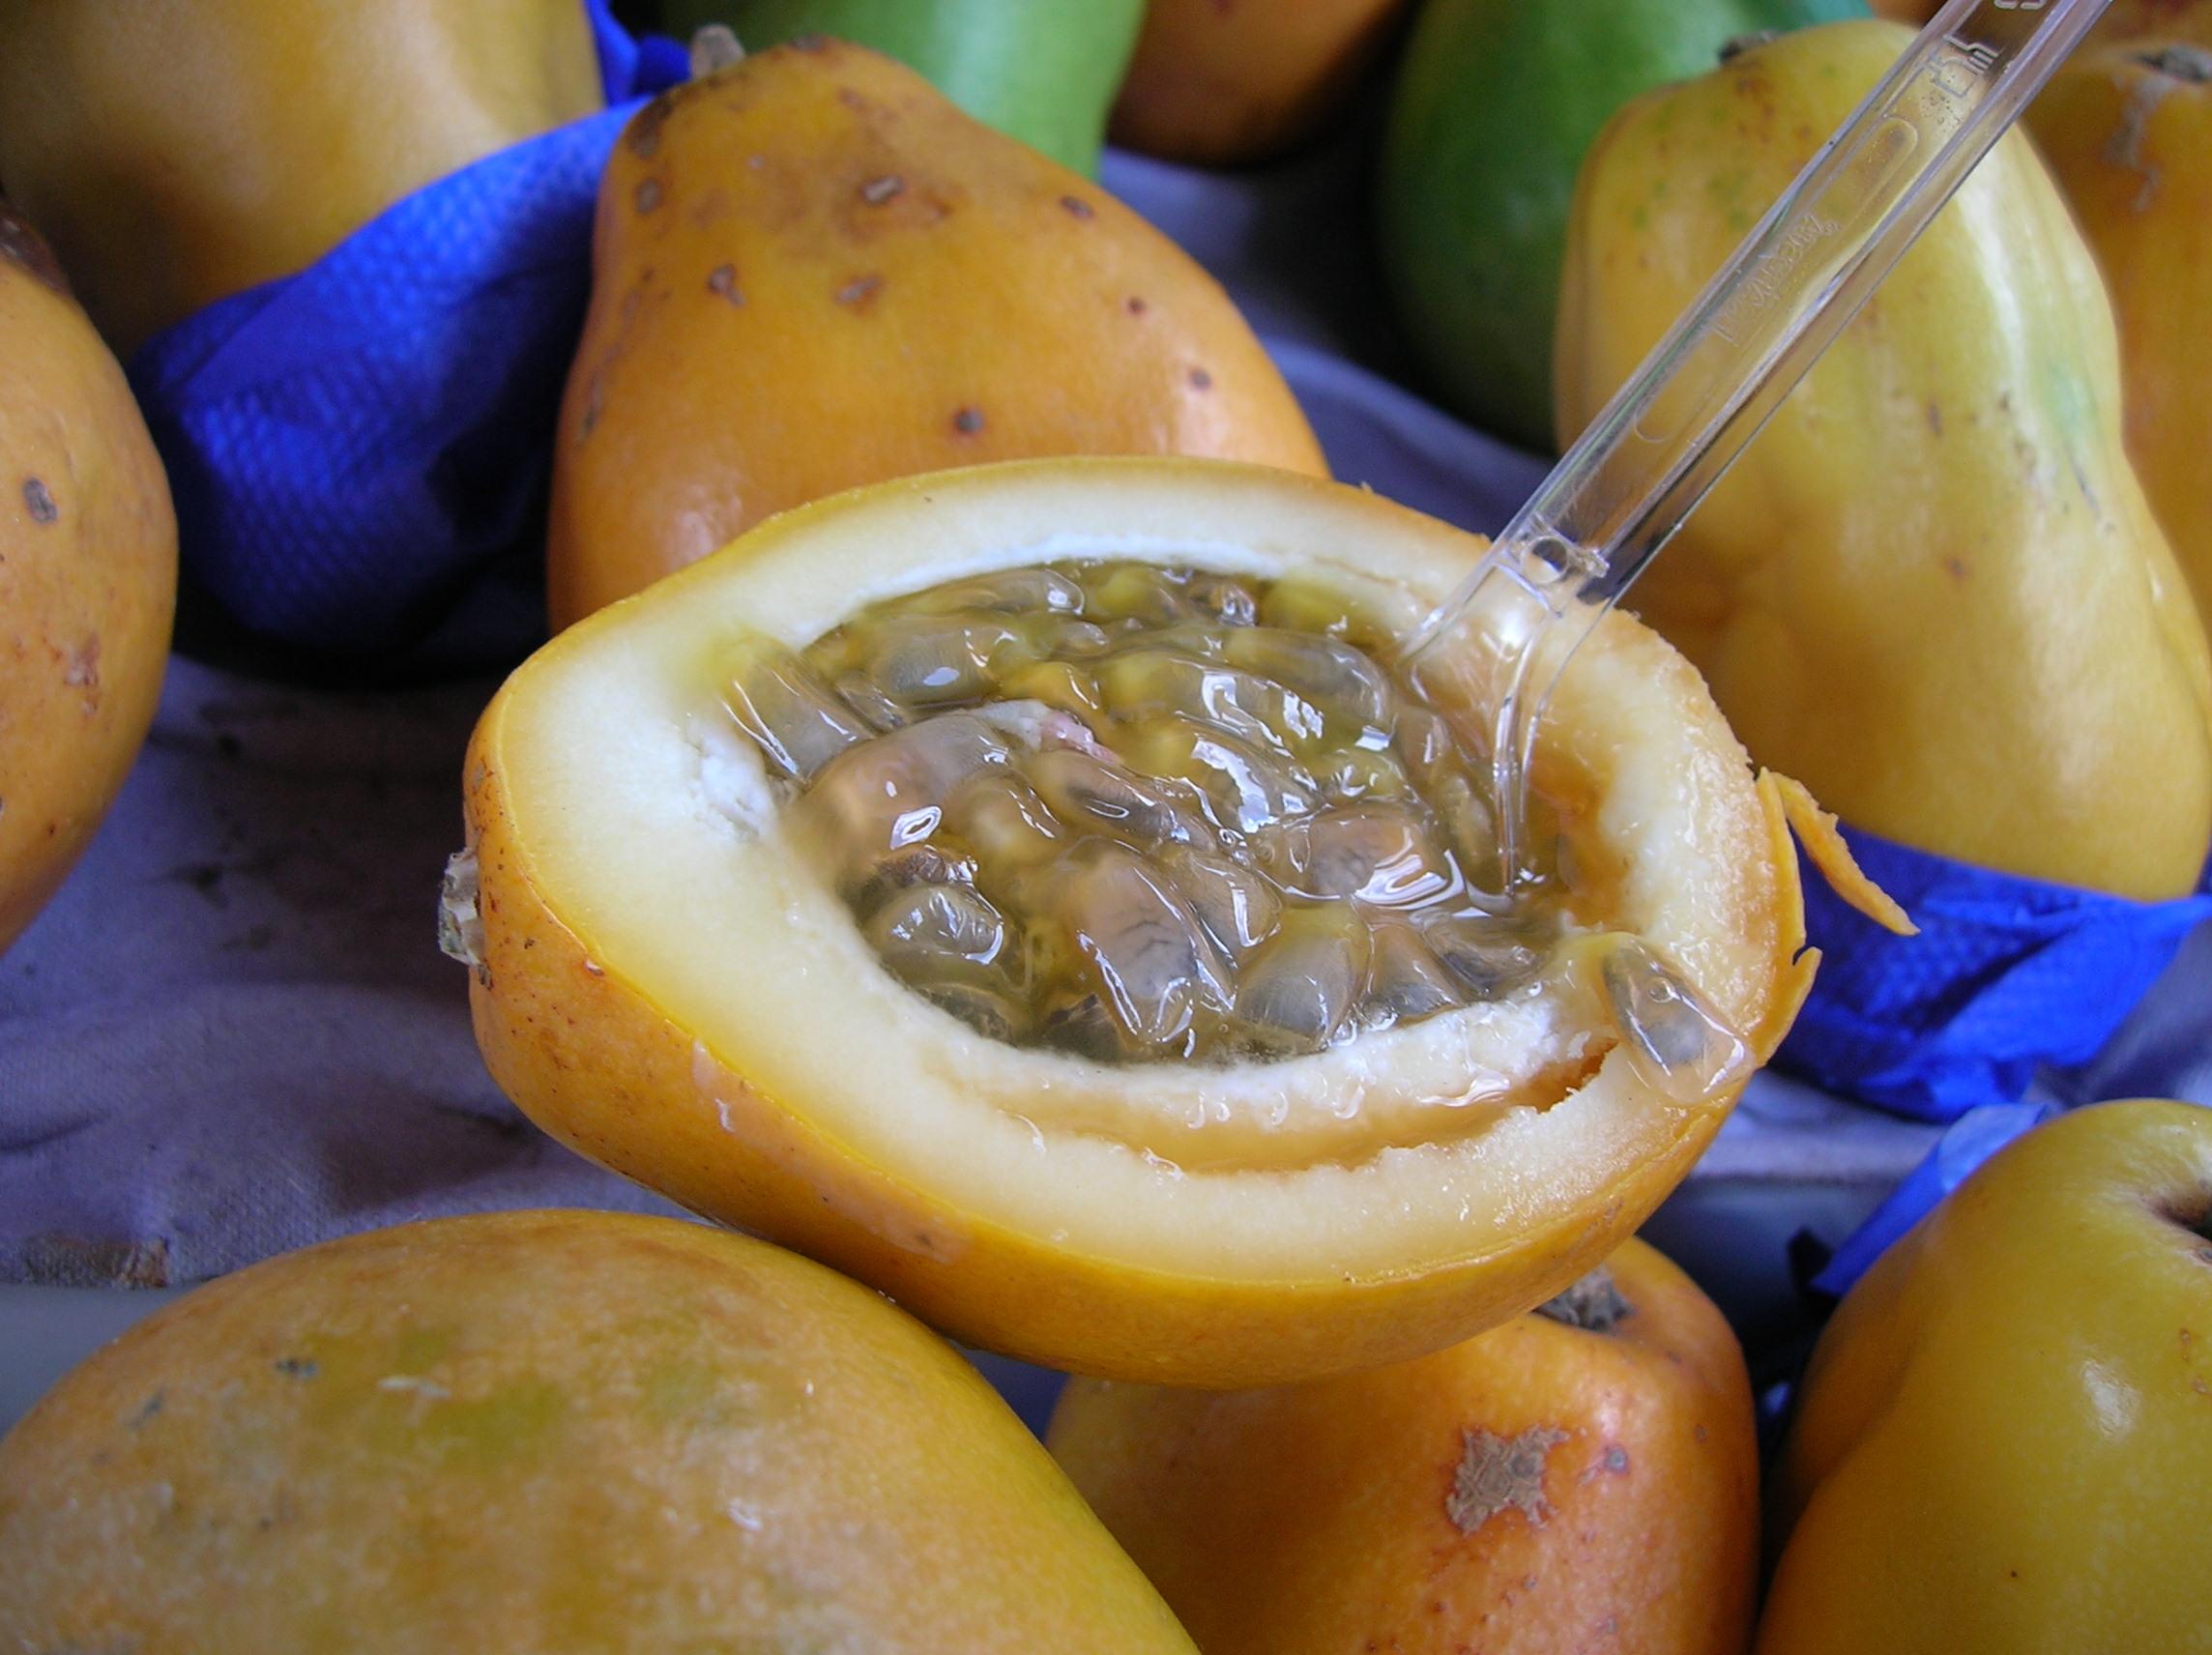 Maracuyá como parte de las frutas exóticas.